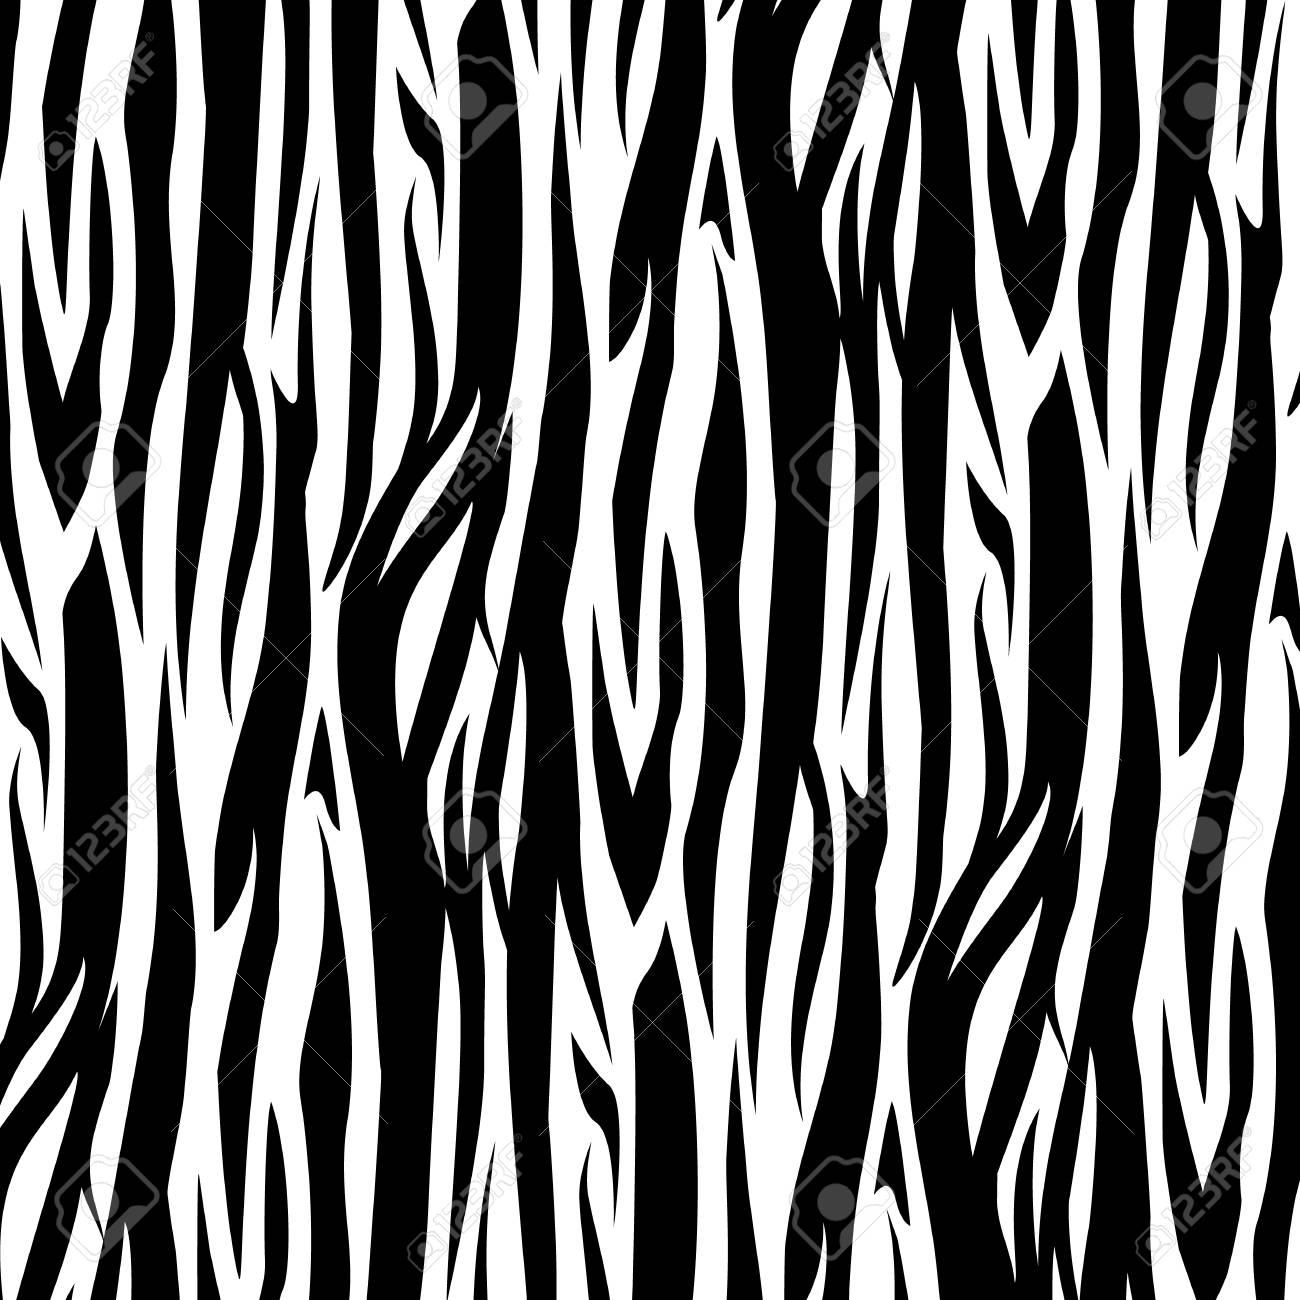 Zebra Stripes Seamless Pattern vector illustration. Black and white - 126941720